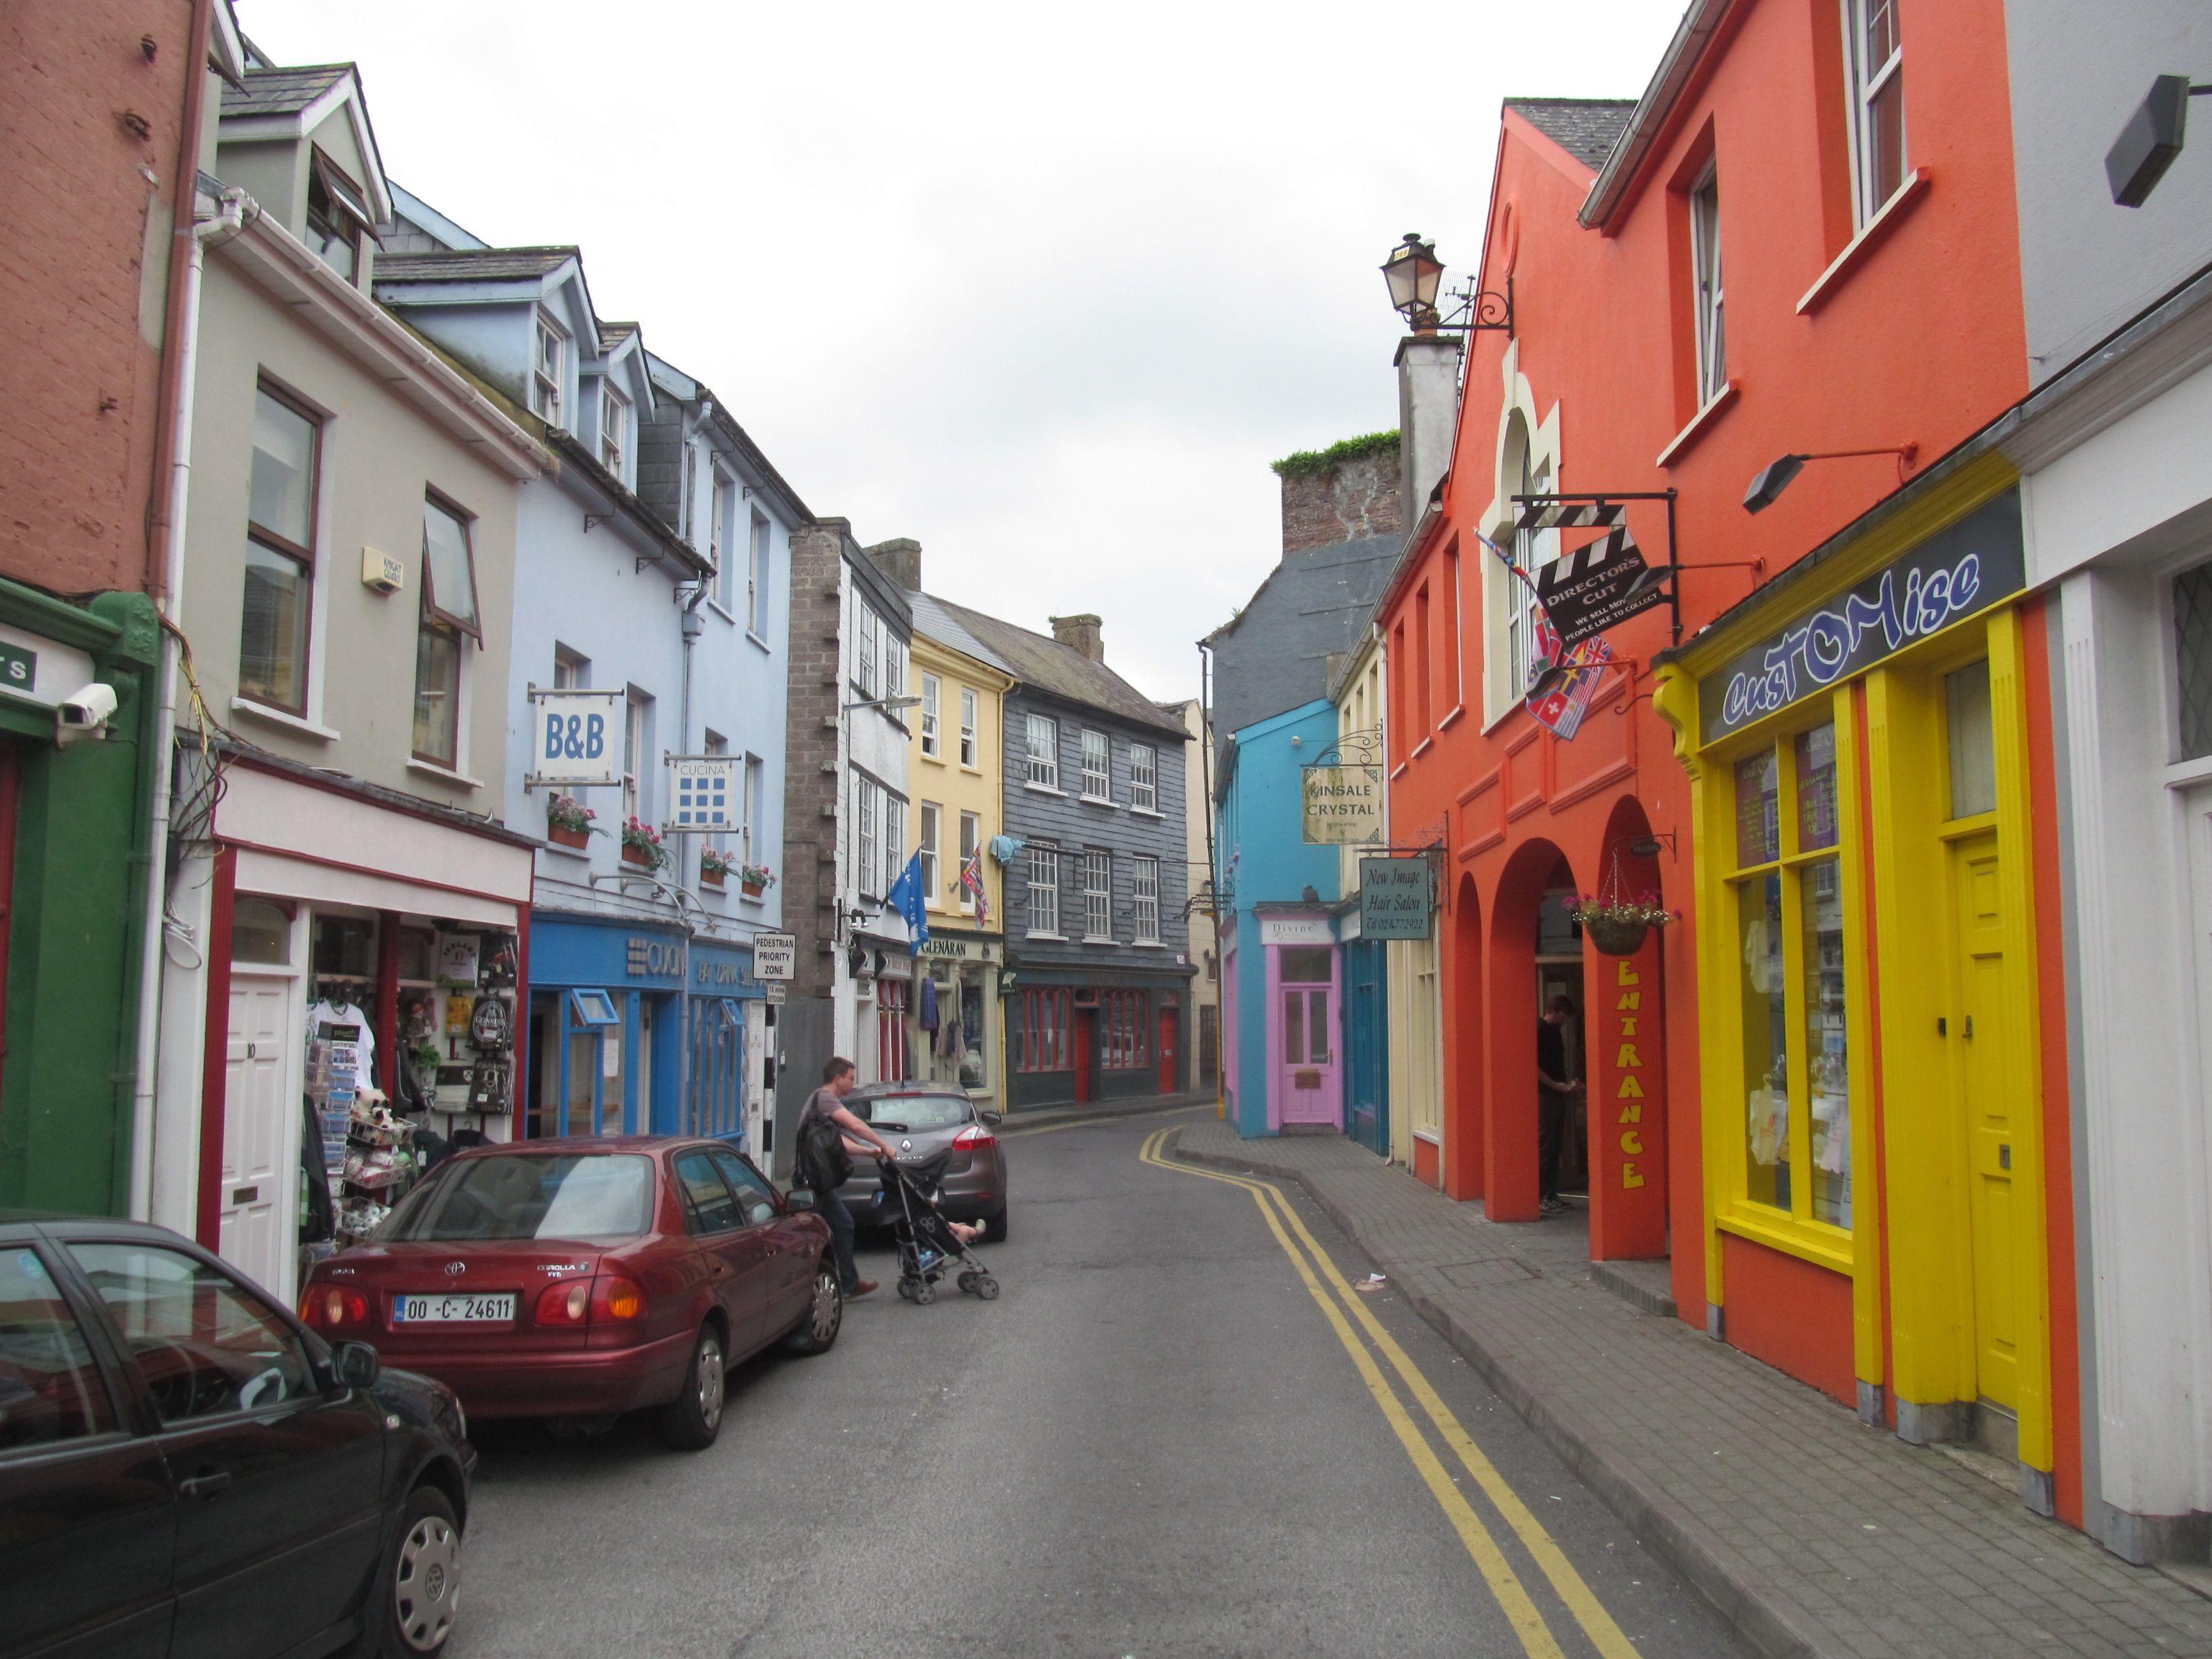 Kinsale travel | County Cork, Ireland - Lonely Planet